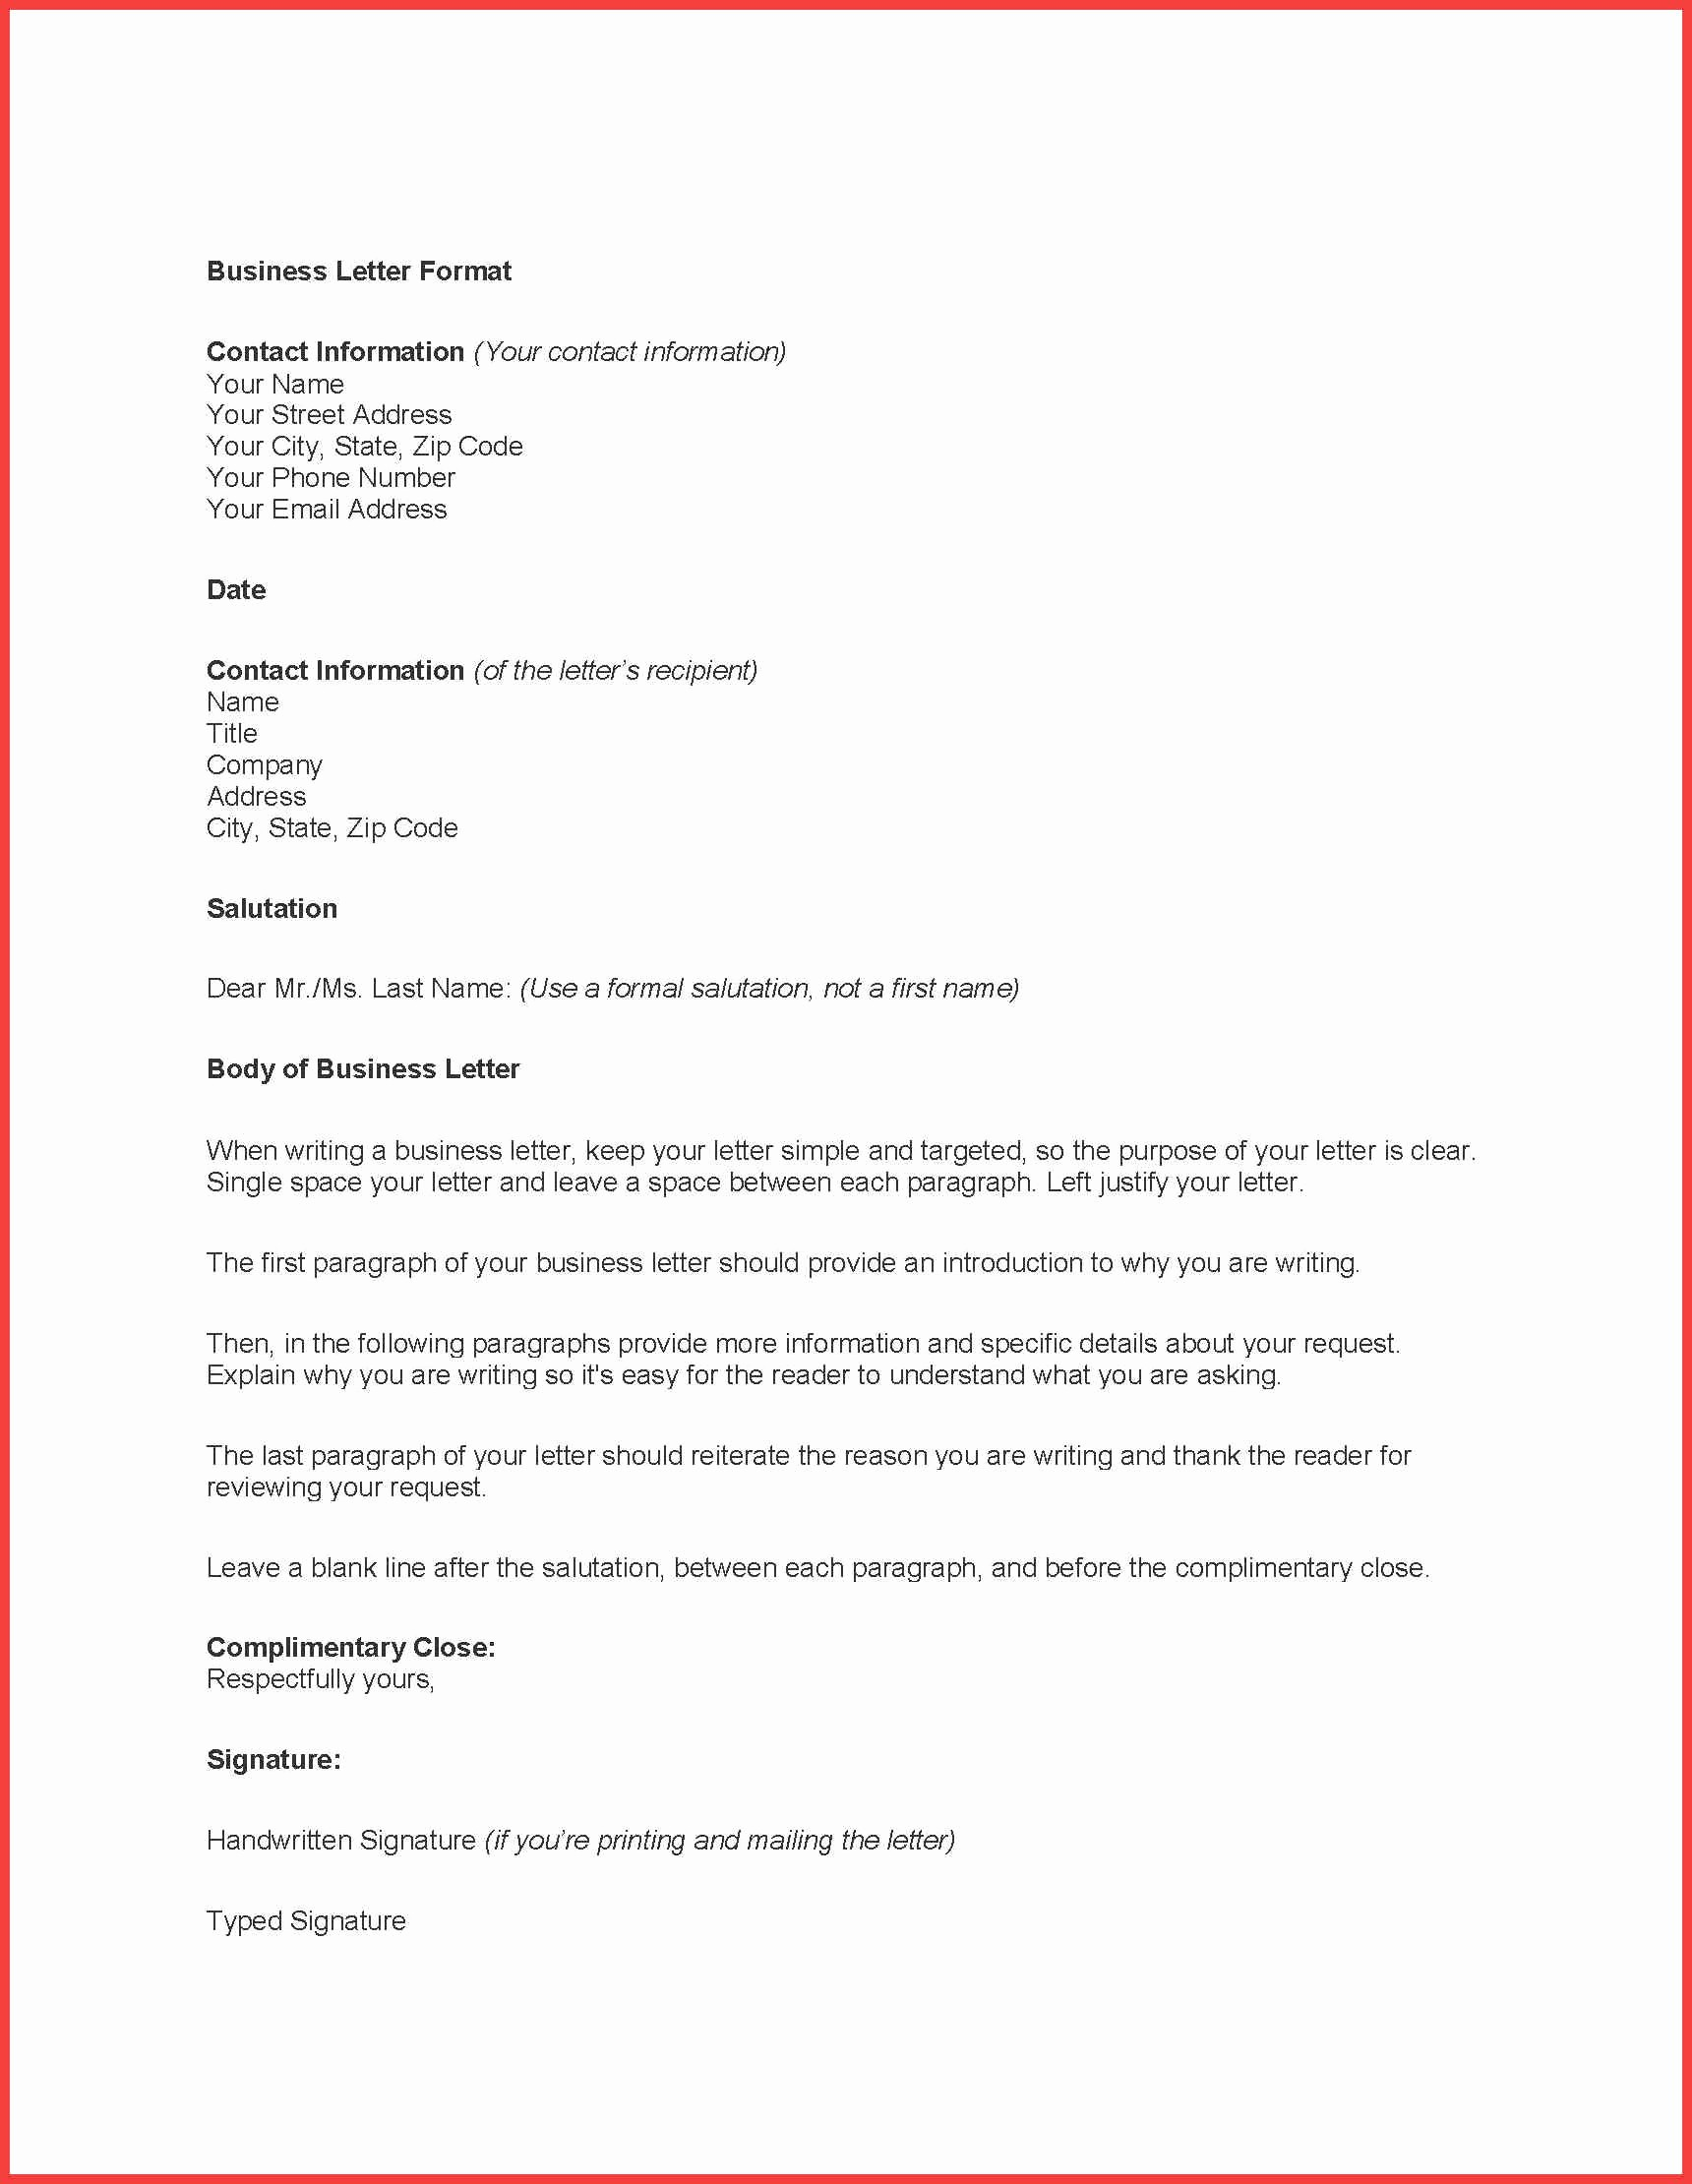 Formal Business Letter Template Word Elegant formal Letter Word Template